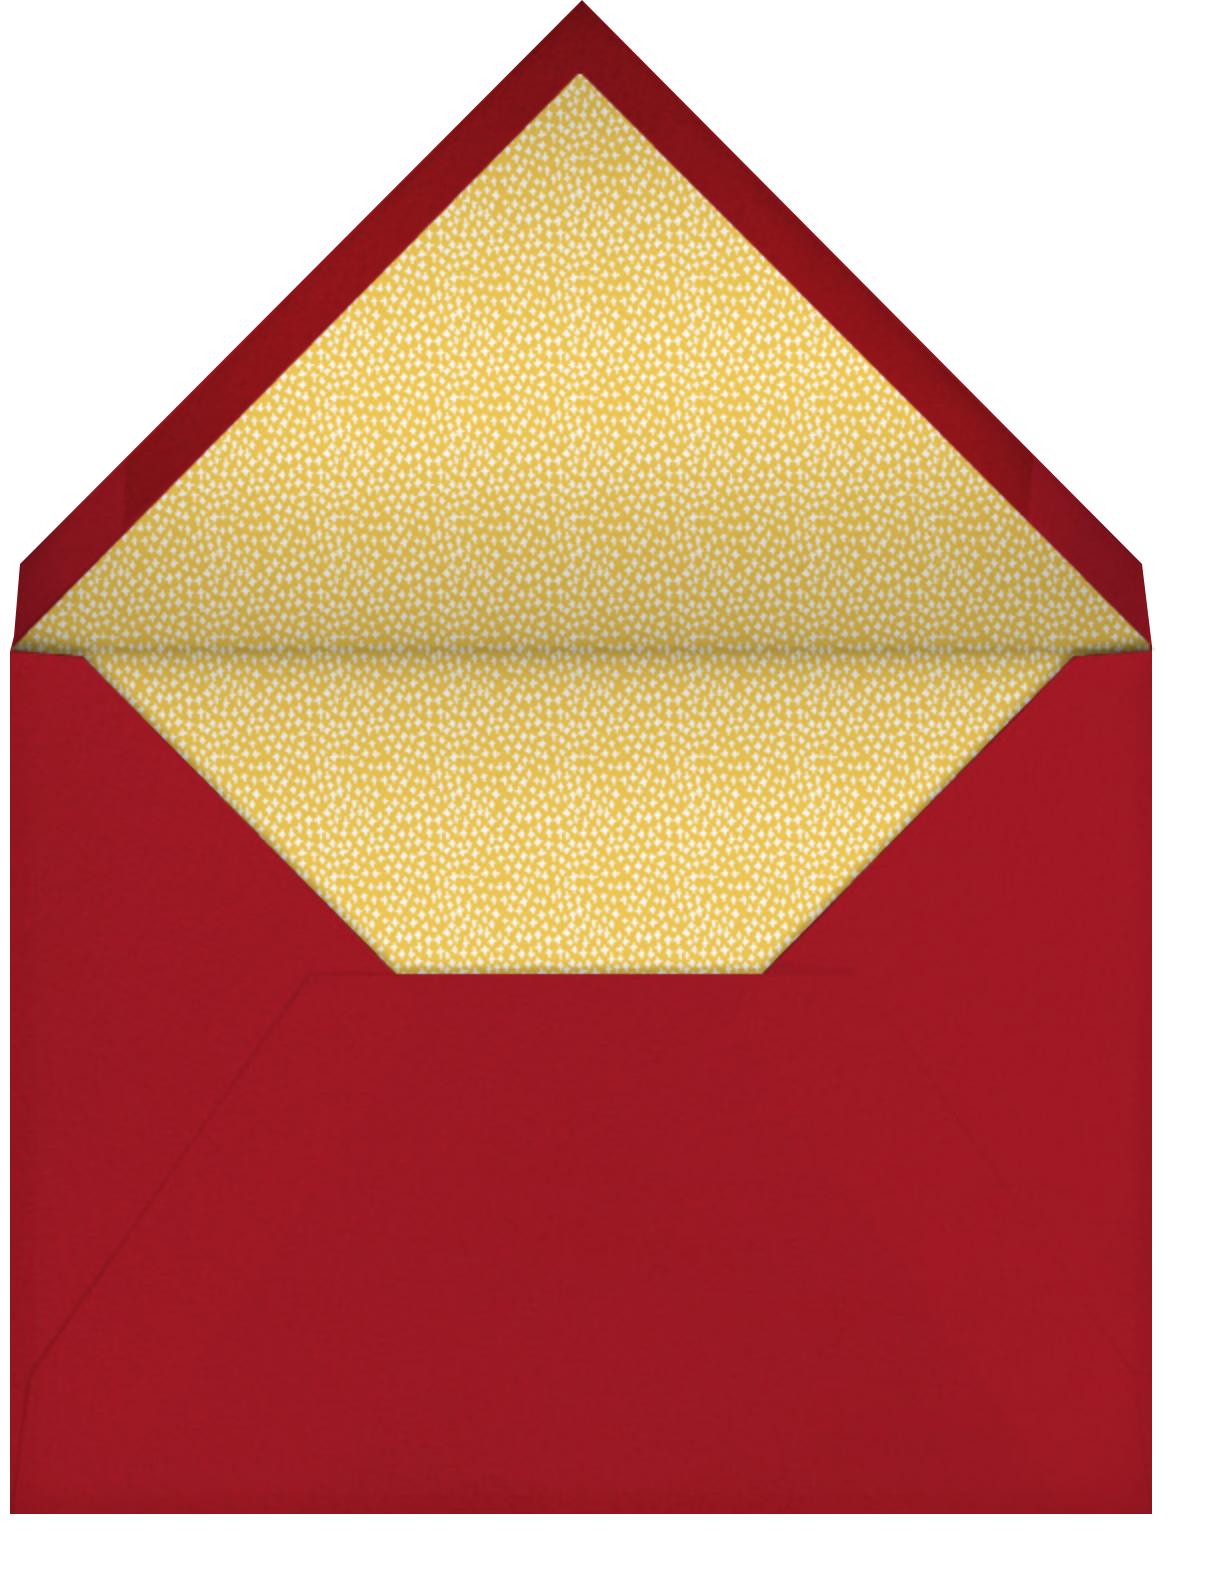 Big Apple Holiday Traffic - Mr. Boddington's Studio - Holiday party - envelope back